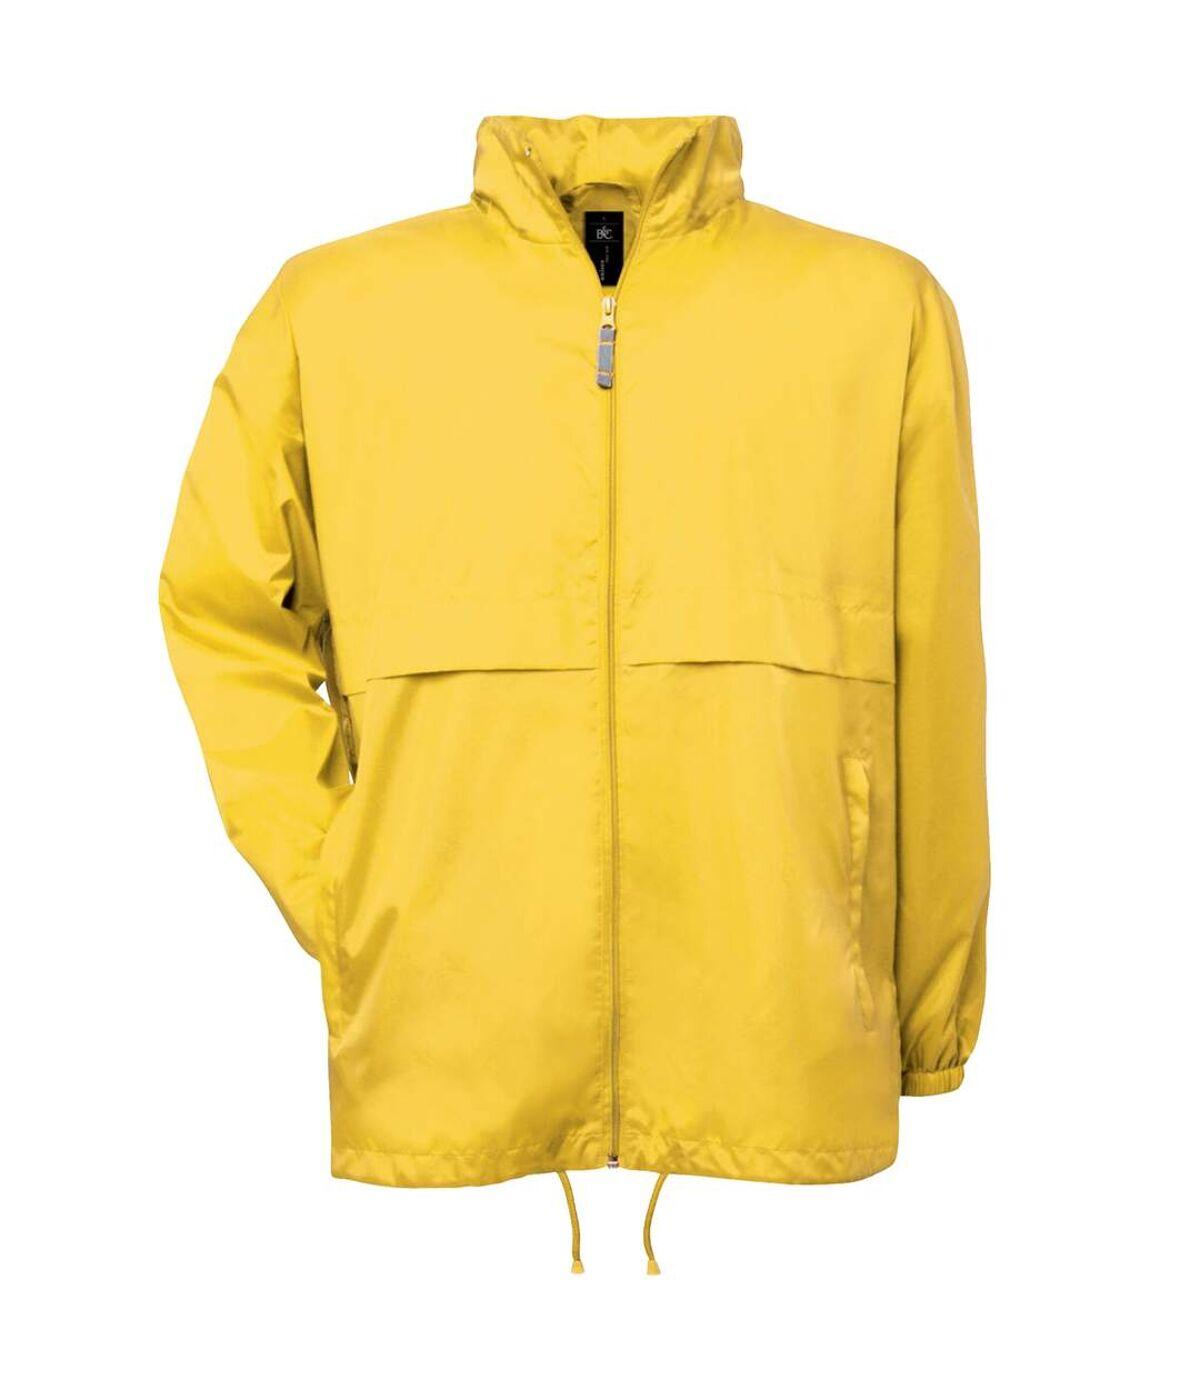 B&C Mens Air Lightweight Windproof, Showerproof & Water Repellent Jacket (Very Yellow) - UTBC1281